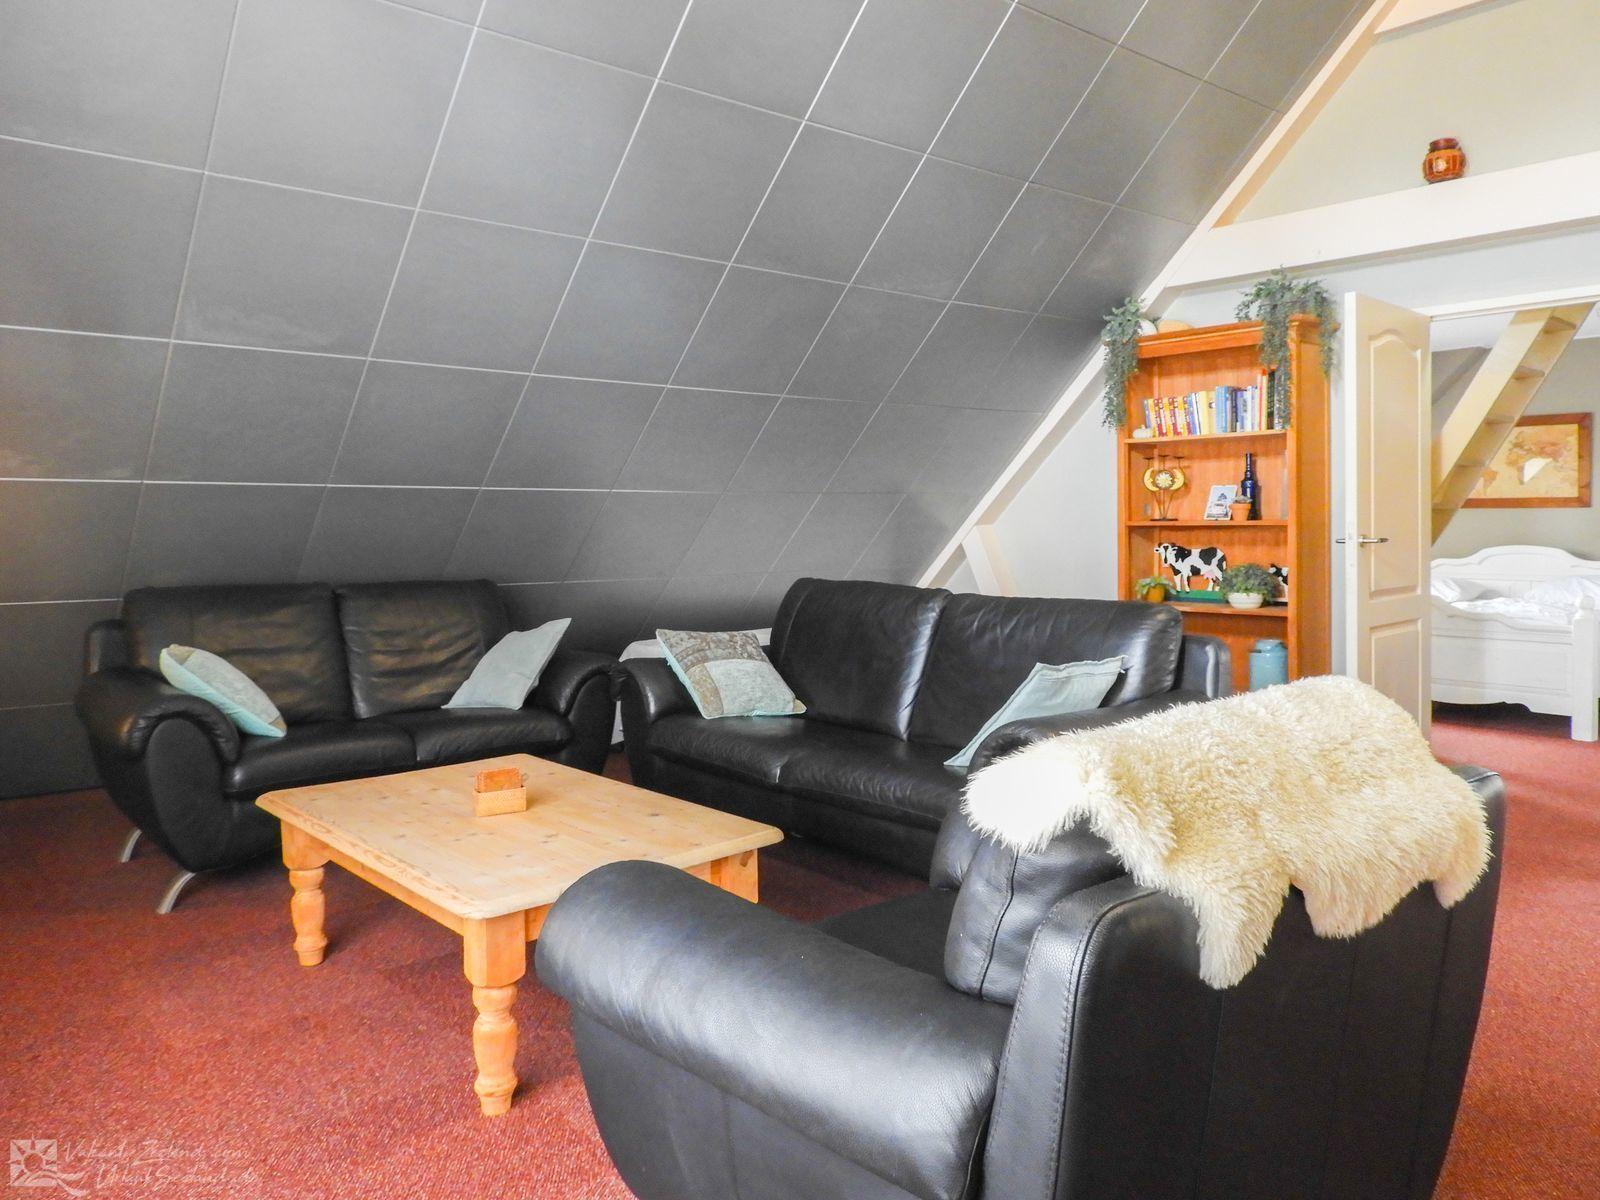 VZ504 Vakantiewoning Biggekerke